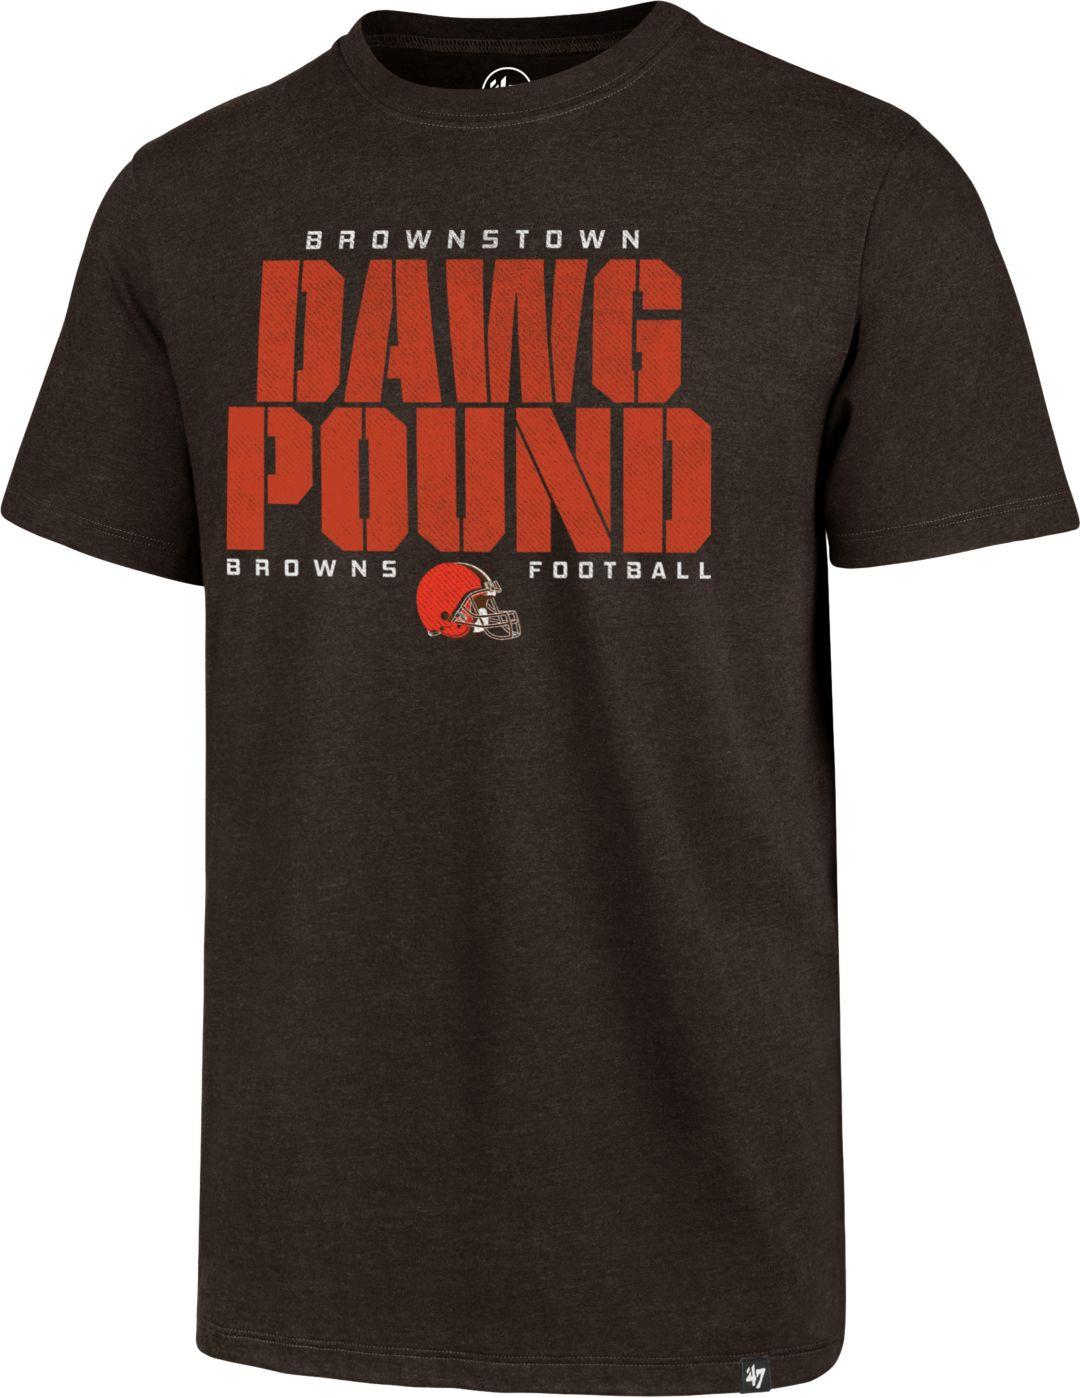 d31a0db9 '47 Men's Cleveland Browns Dawg Pound Club Brown T-Shirt